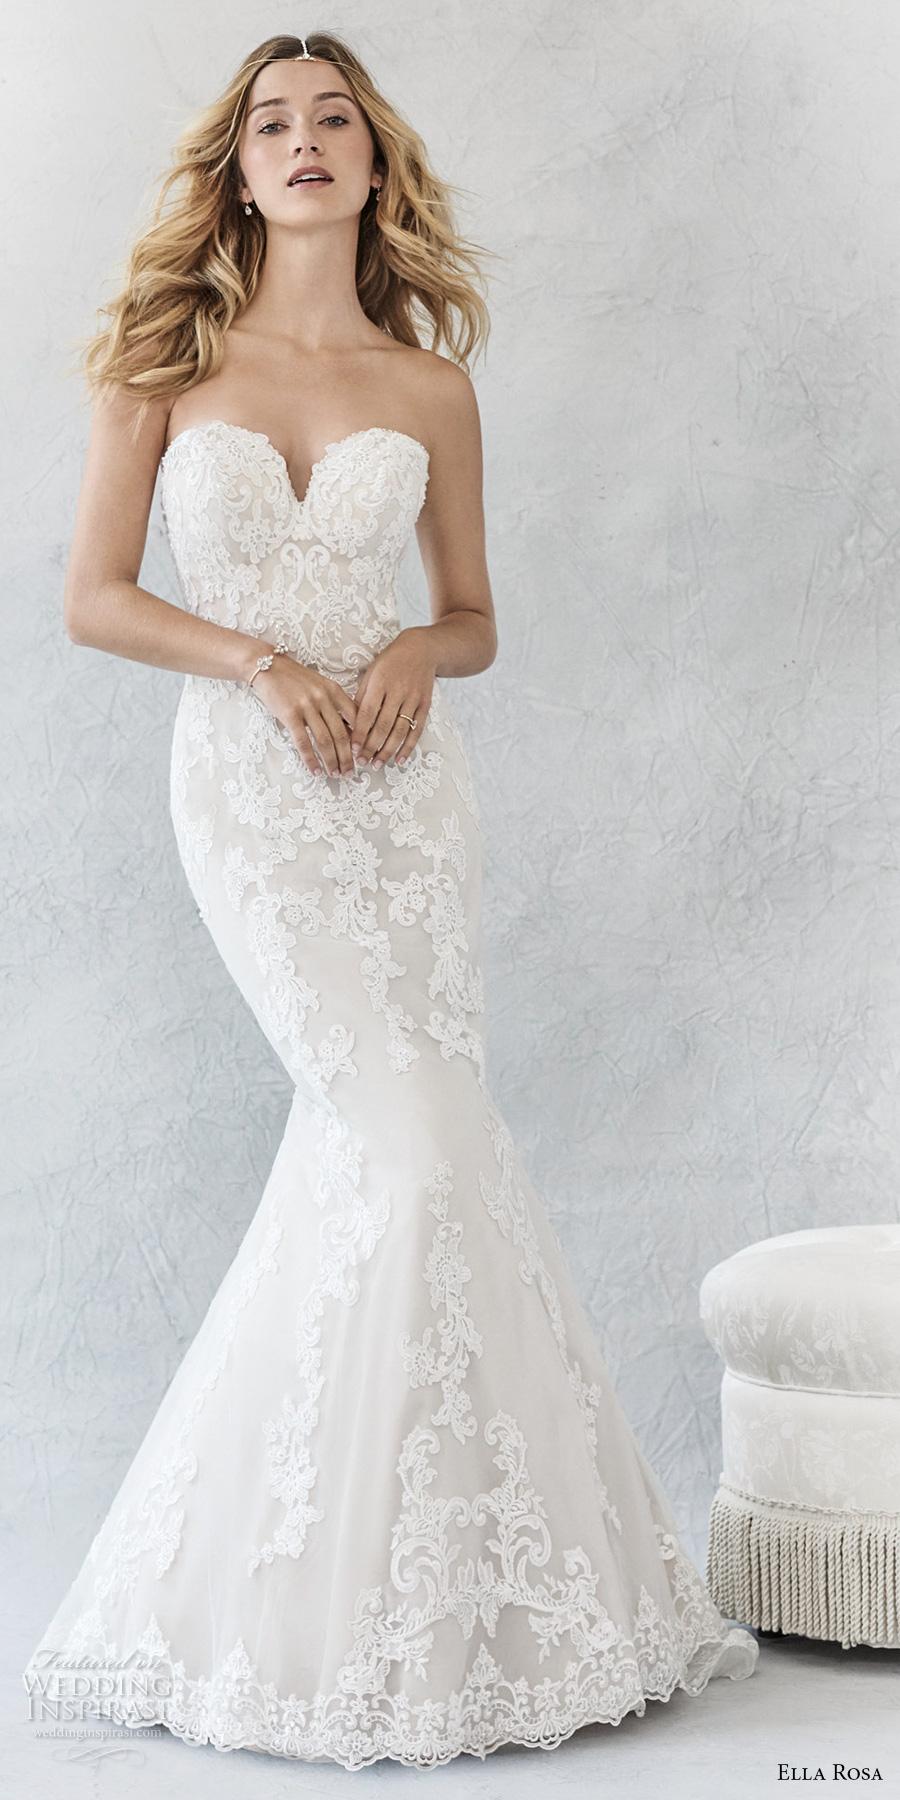 ella rosa spring 2017 bridal sleeveless strapless deep sweetheart neckline heavily embellished bodice elegant romantic mermaid wedding dress (372) mv